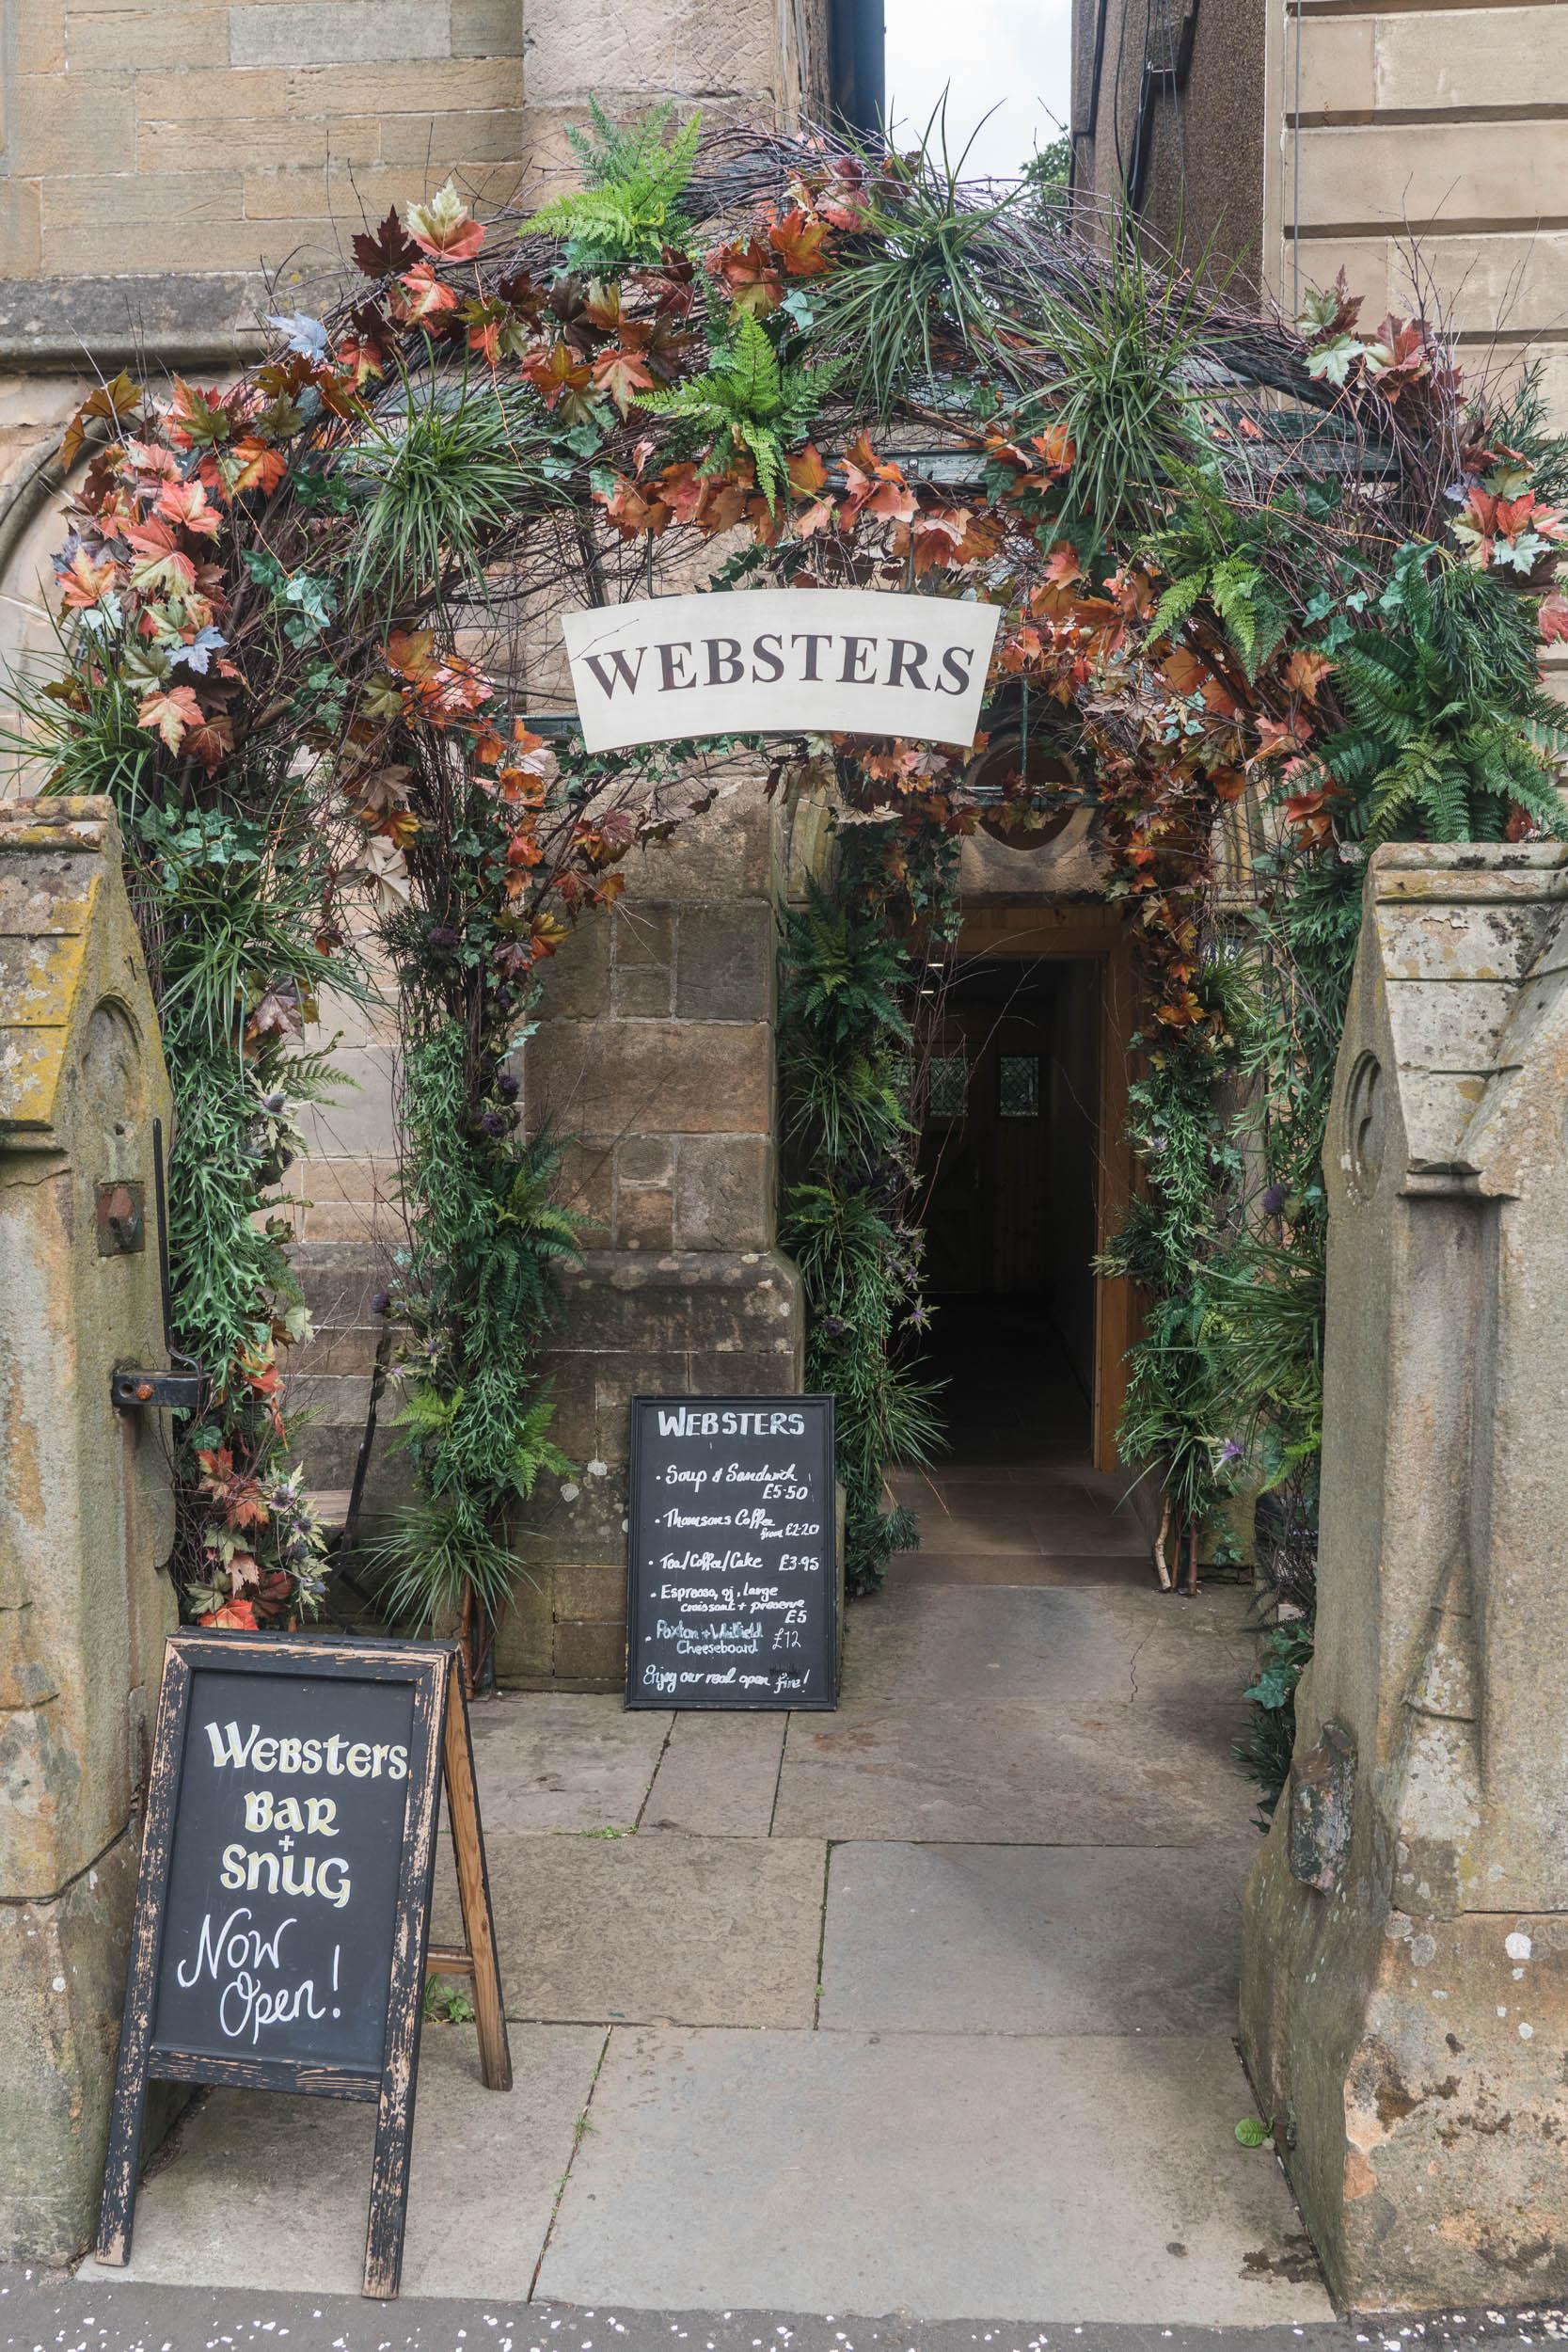 Websters Theatre & Pub